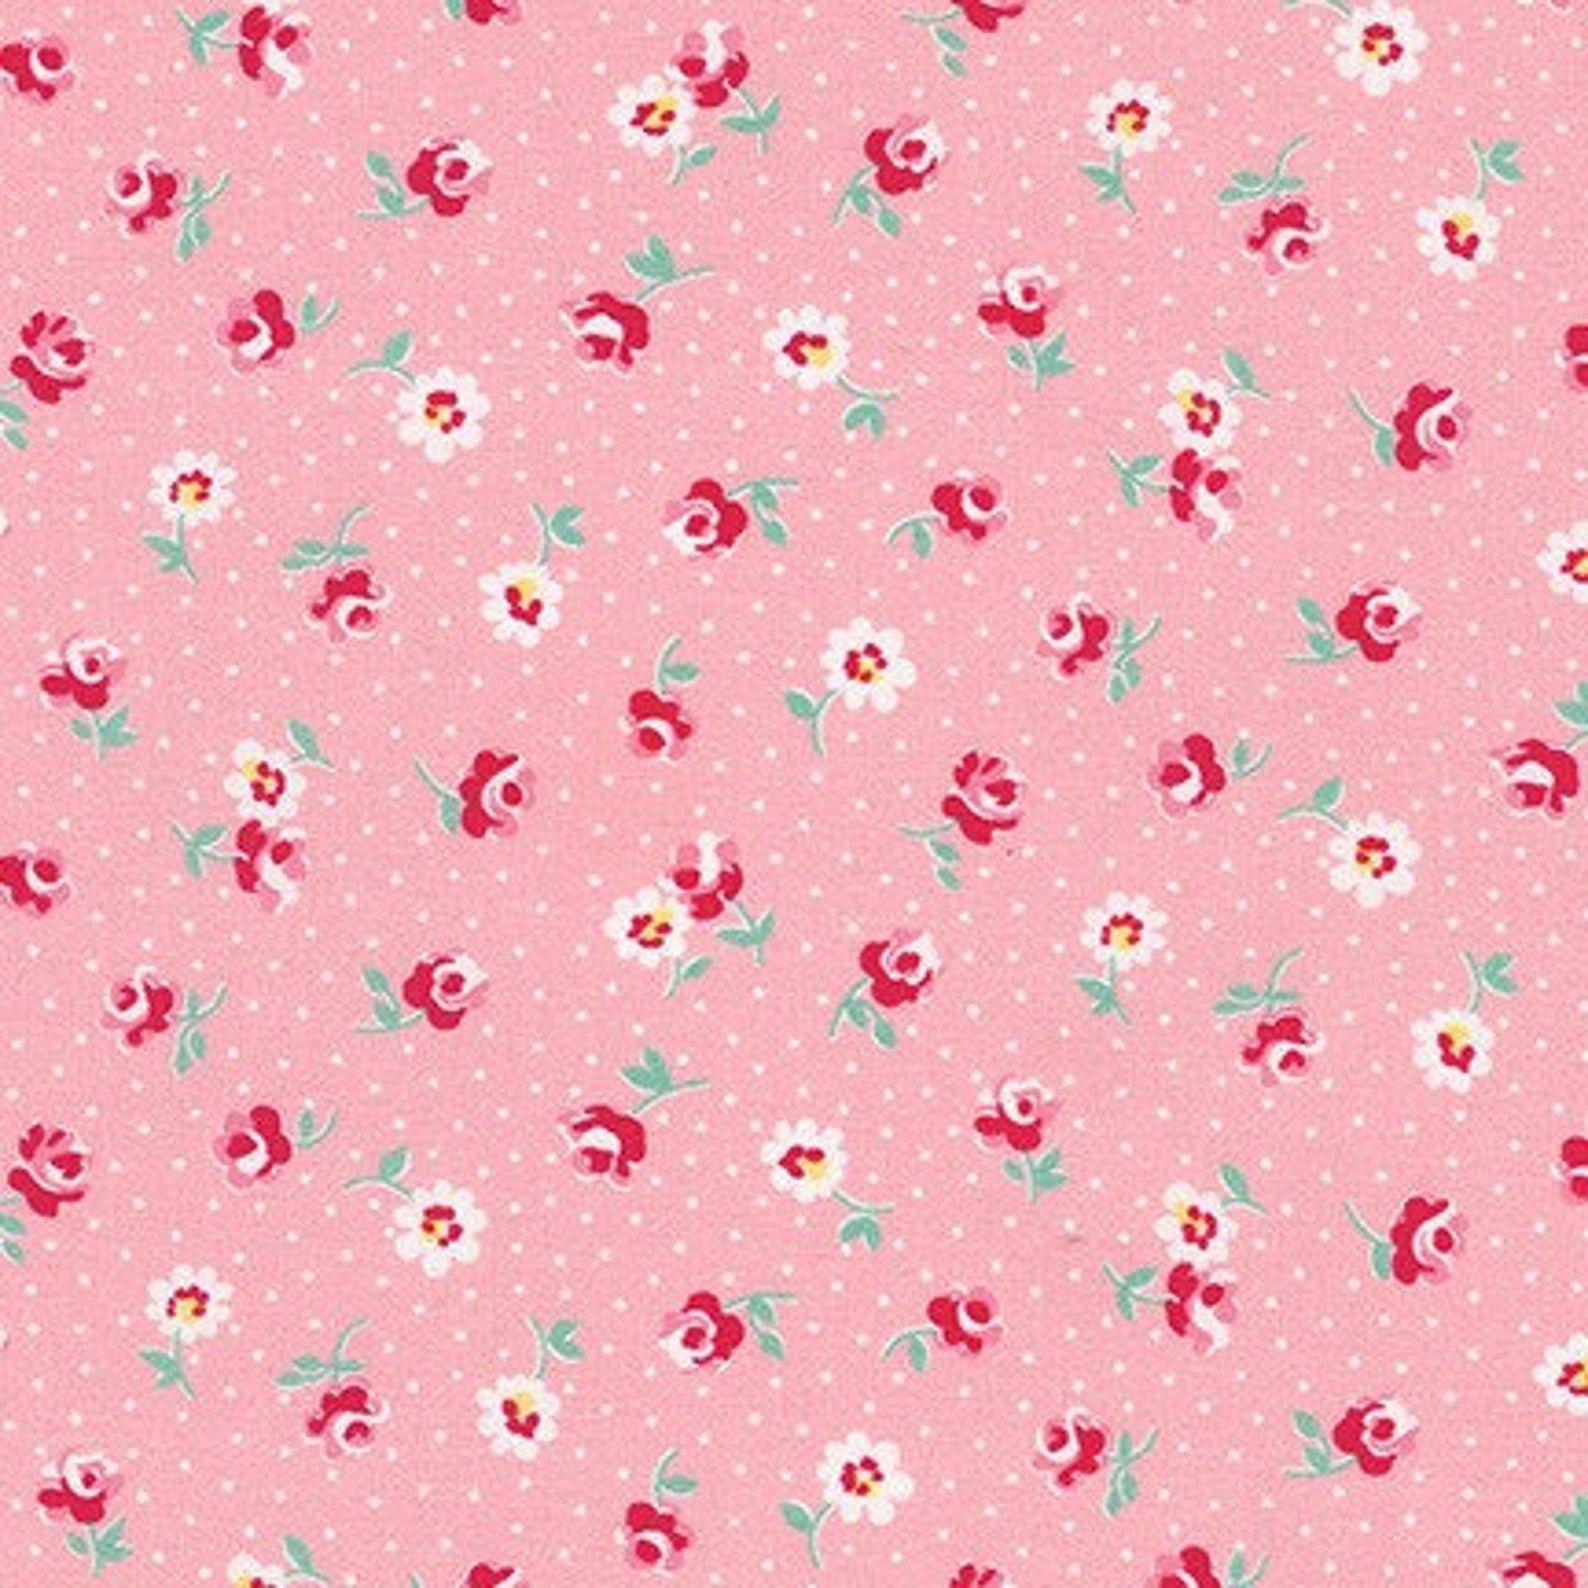 Darlene's Favorites Camellia Flowers for Robert Kaufman -Fat Quarte